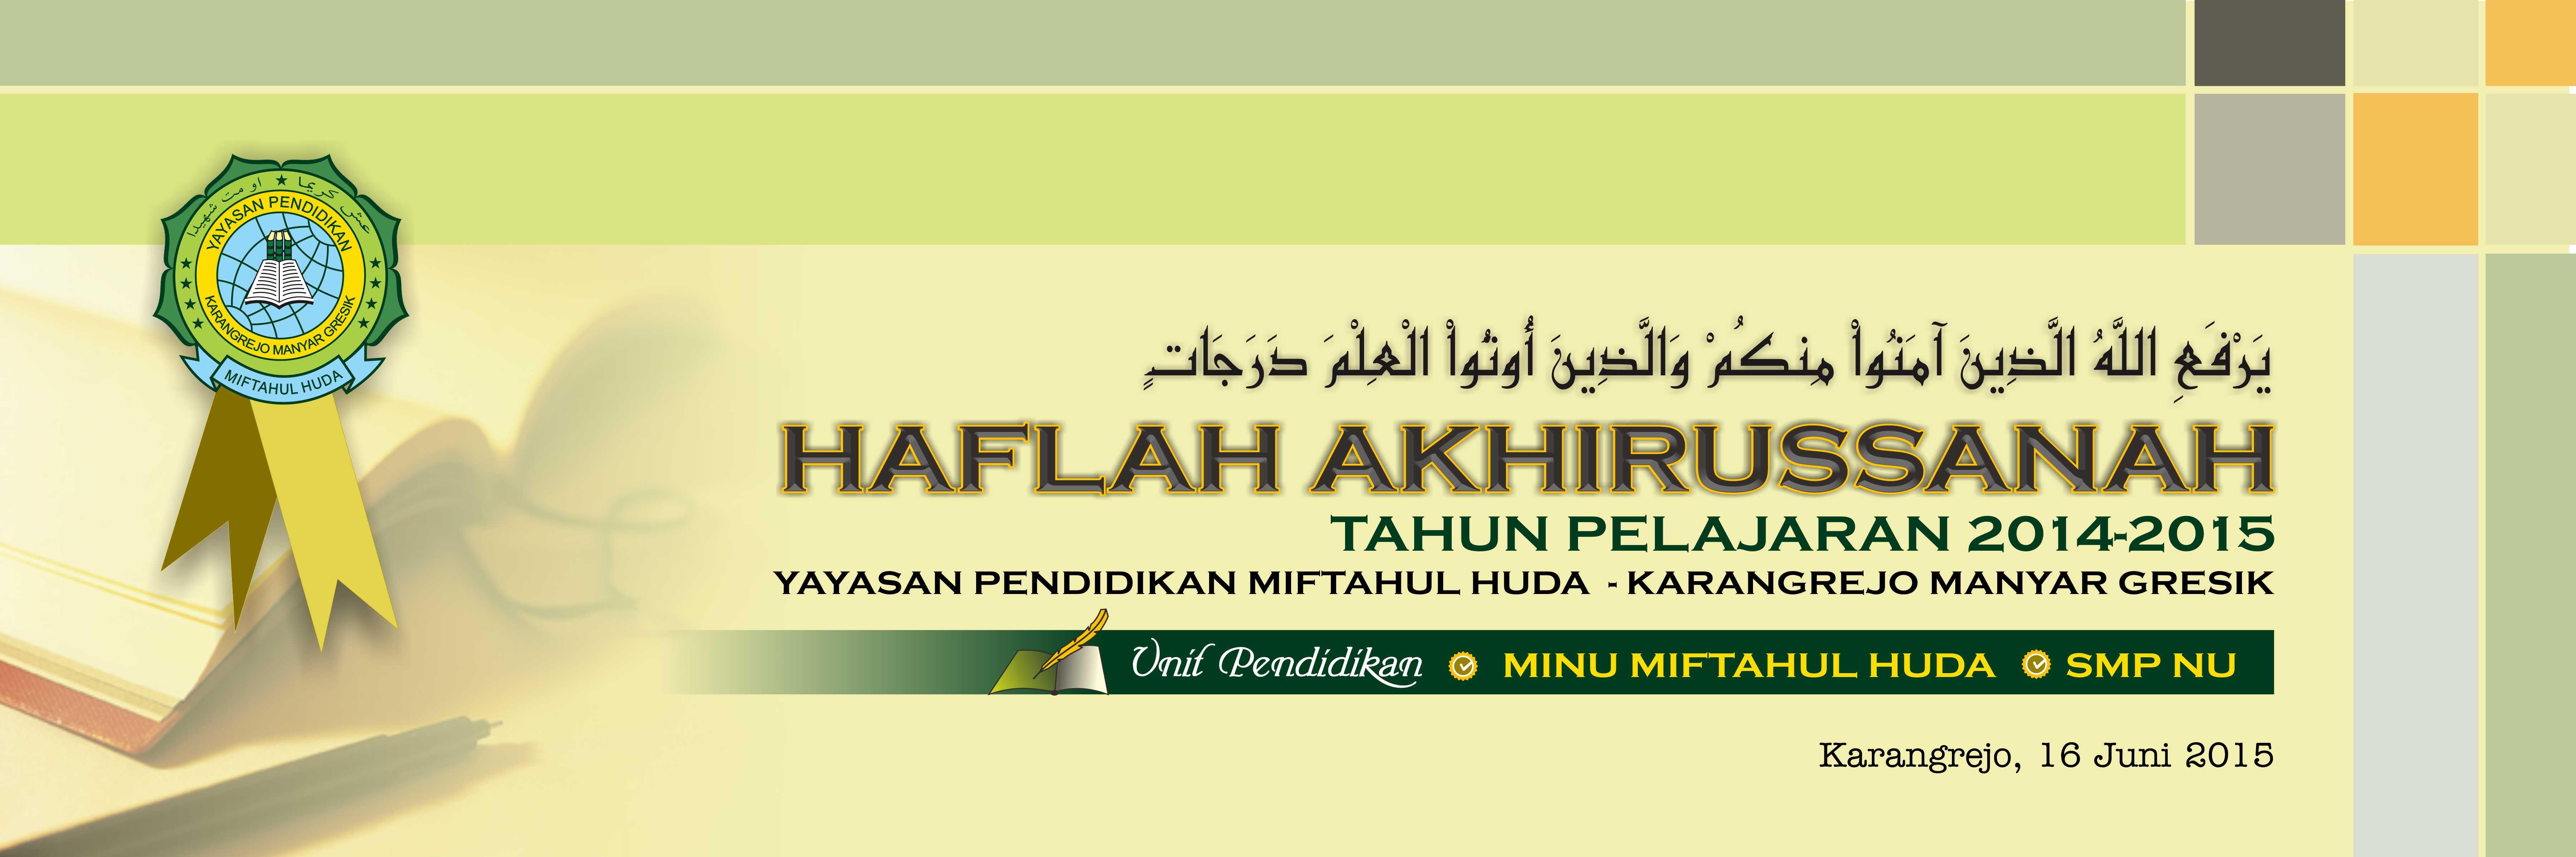 Banner Haflah